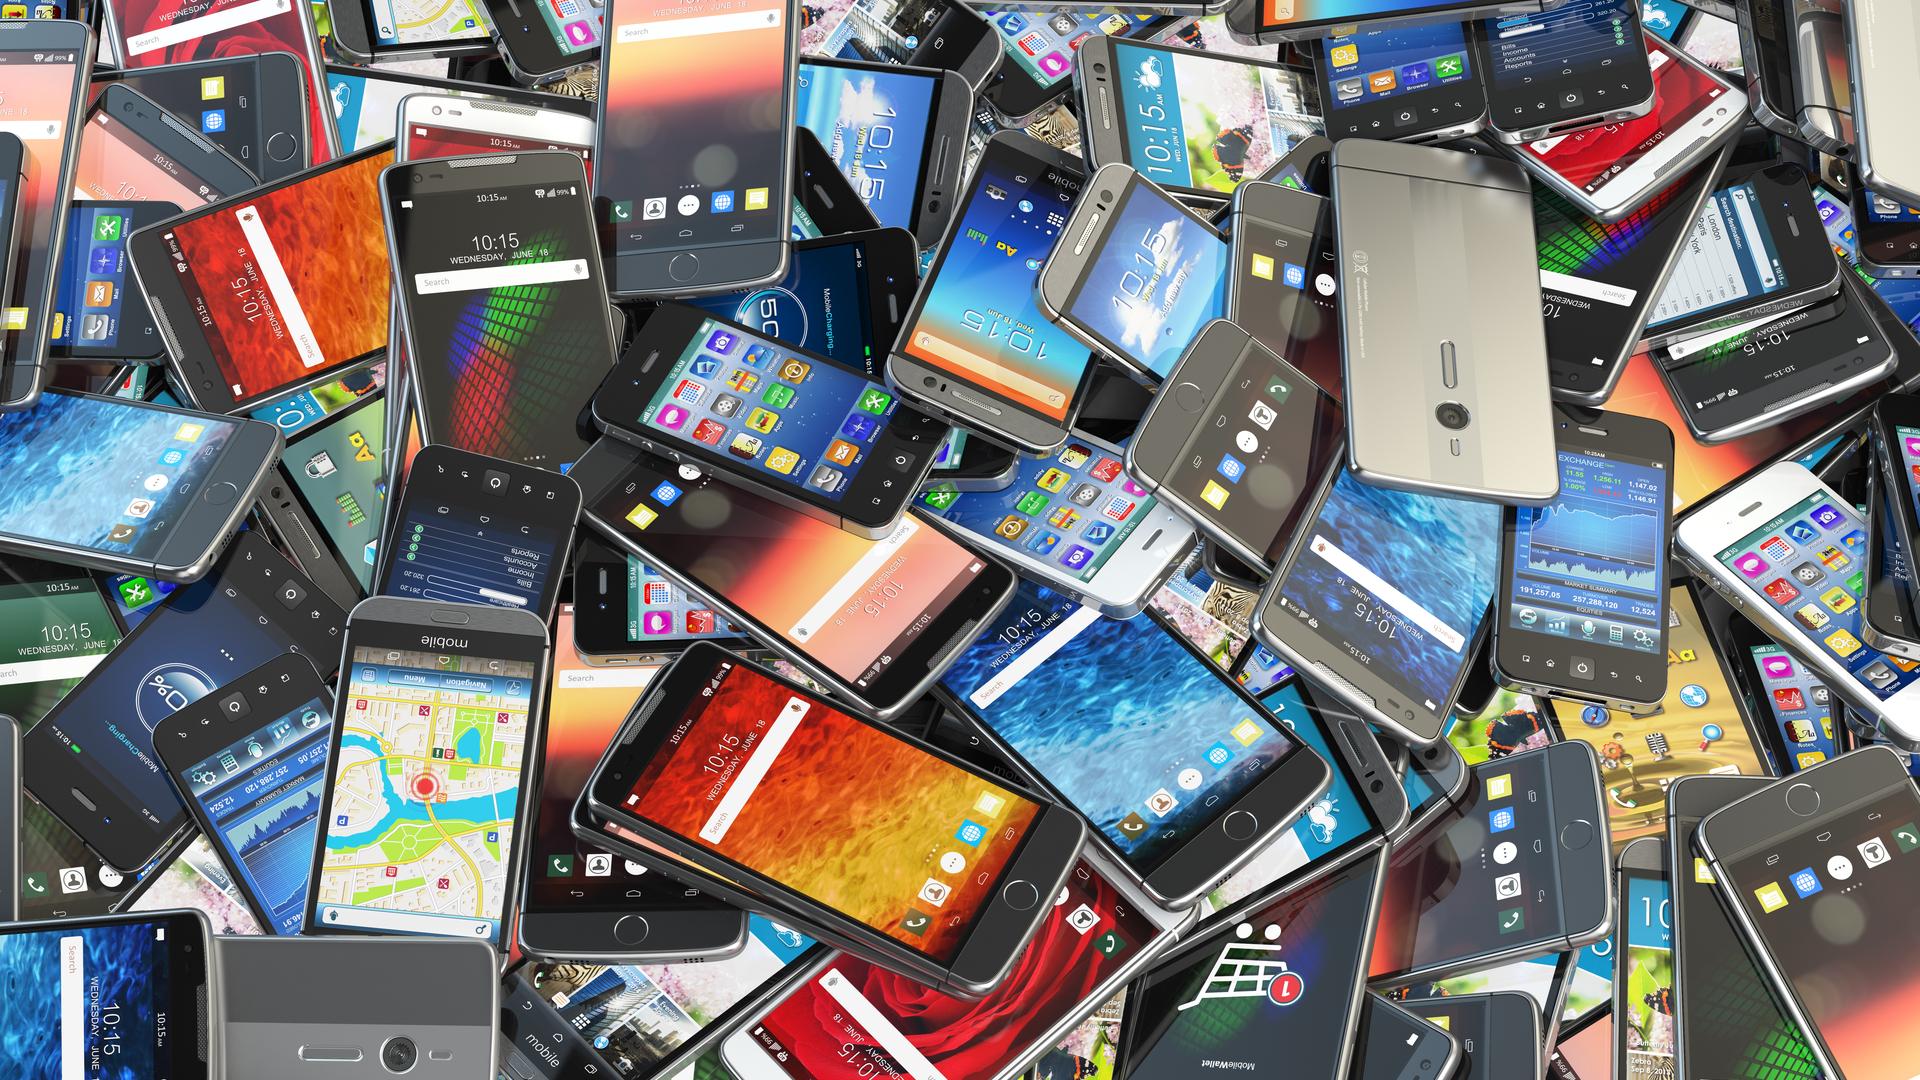 manufacture Mobile Phones in India